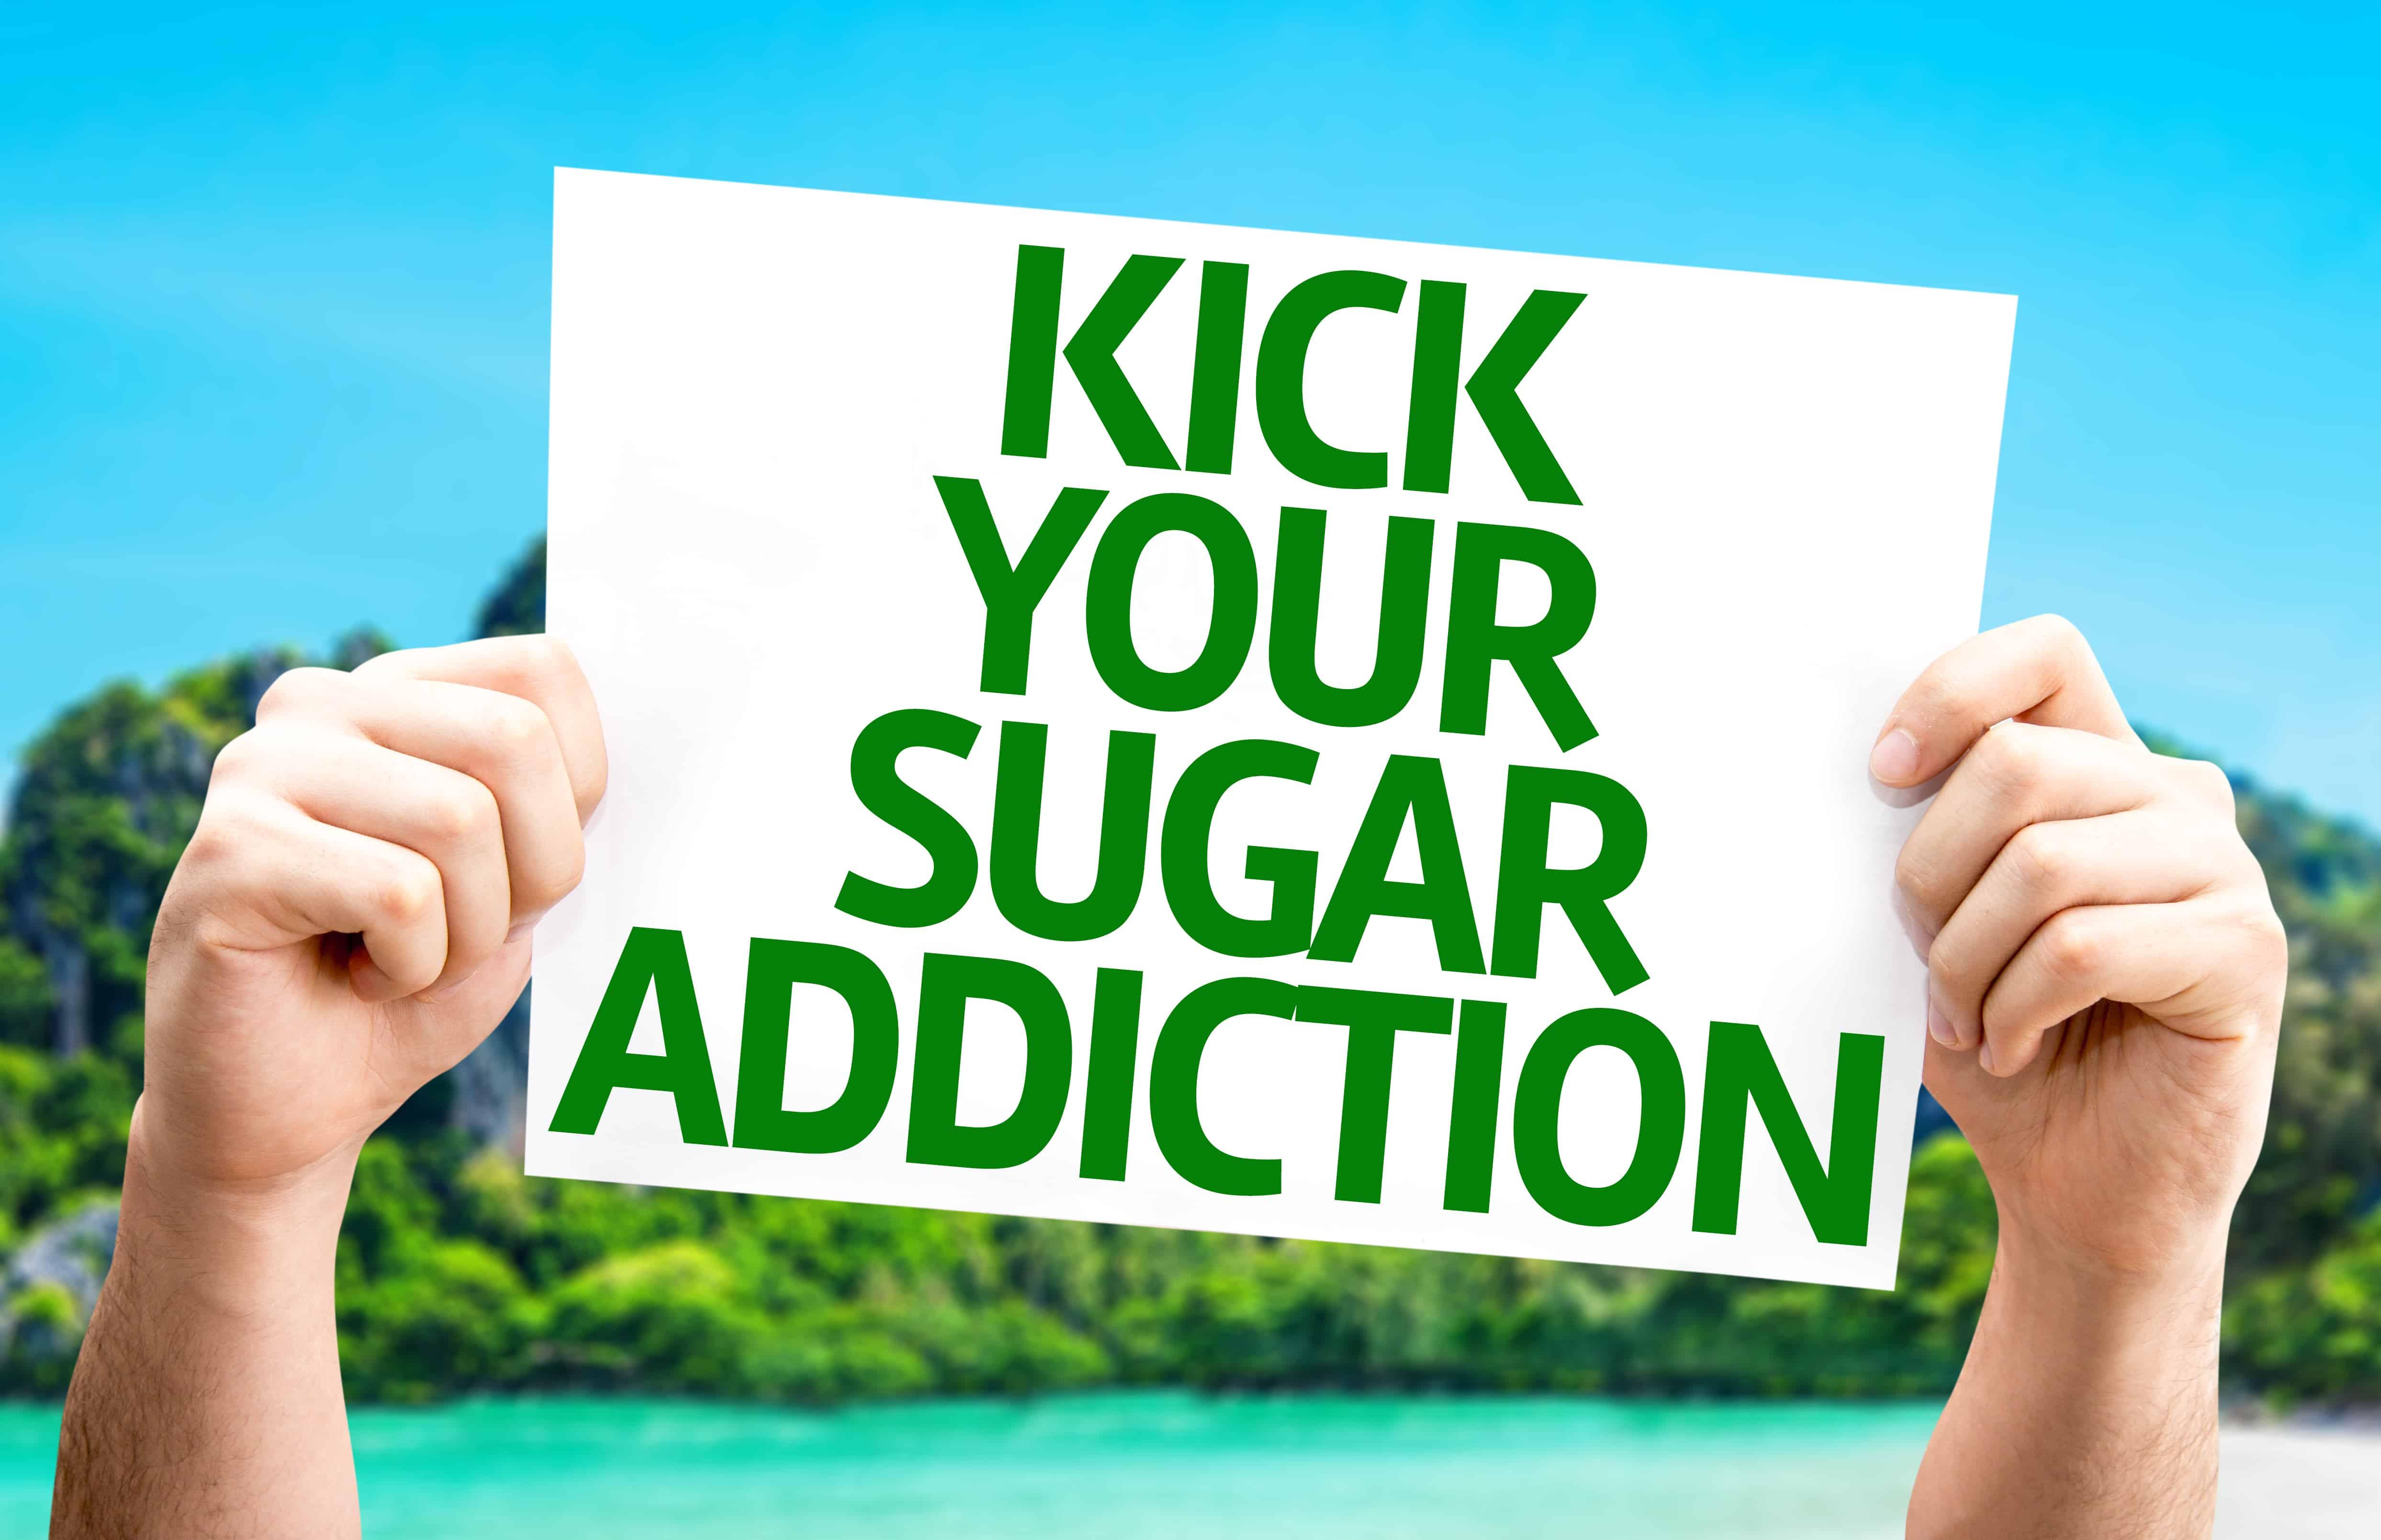 kick your sugar addiction